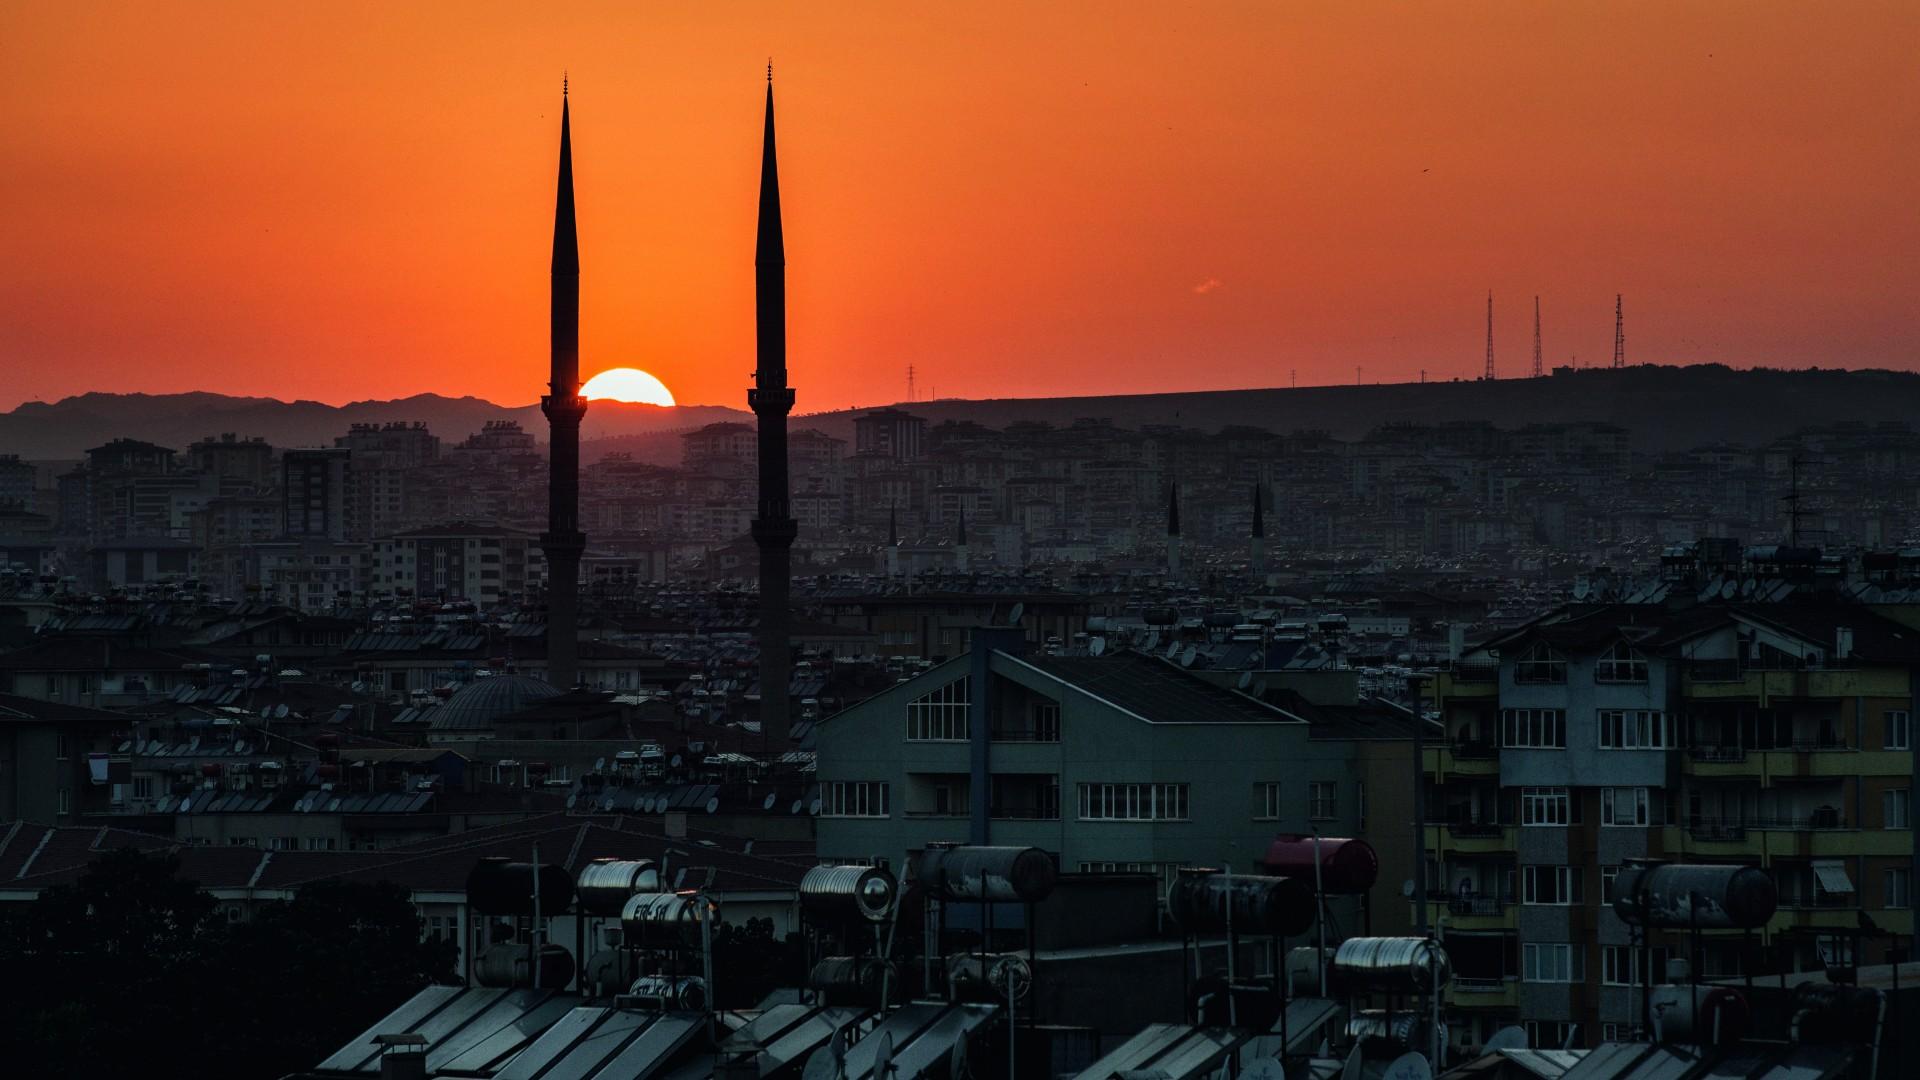 28 June 2016, Gaziantep, Turkey